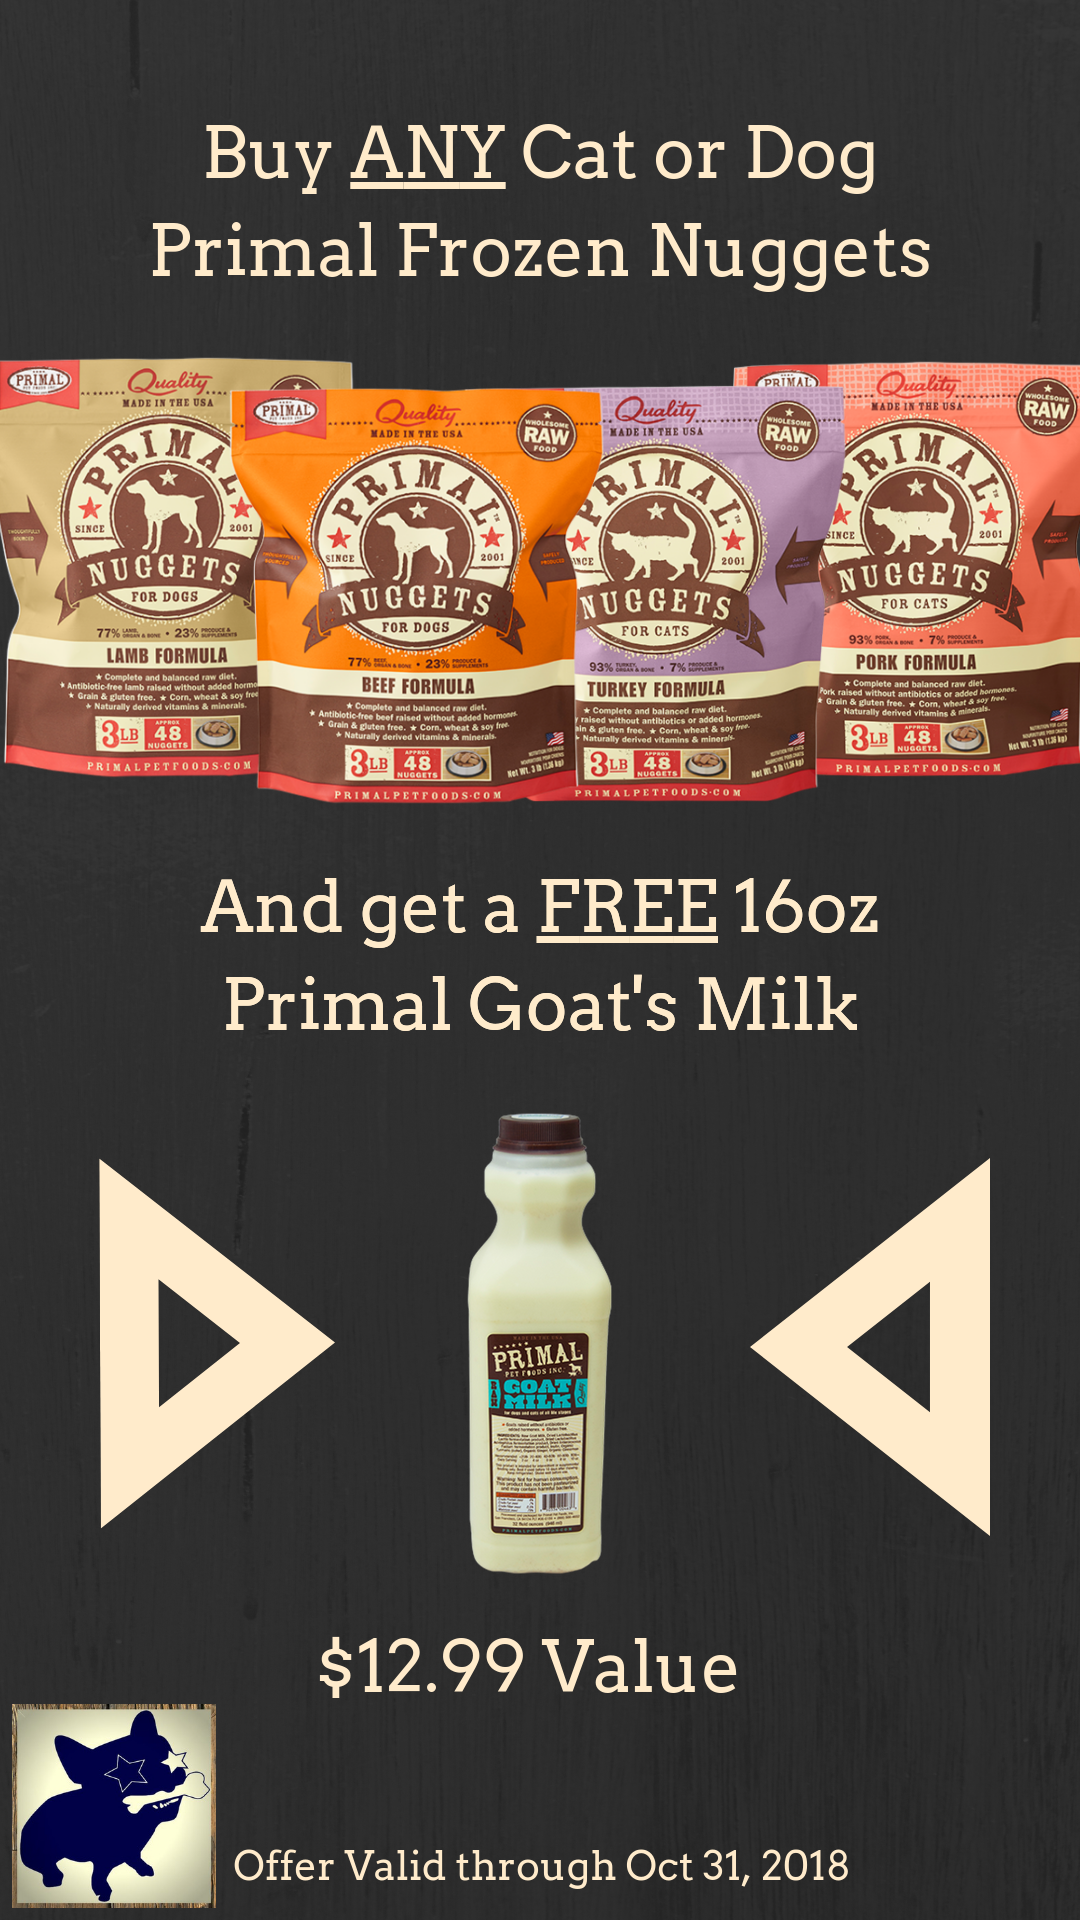 Primal Goat Milk Promo